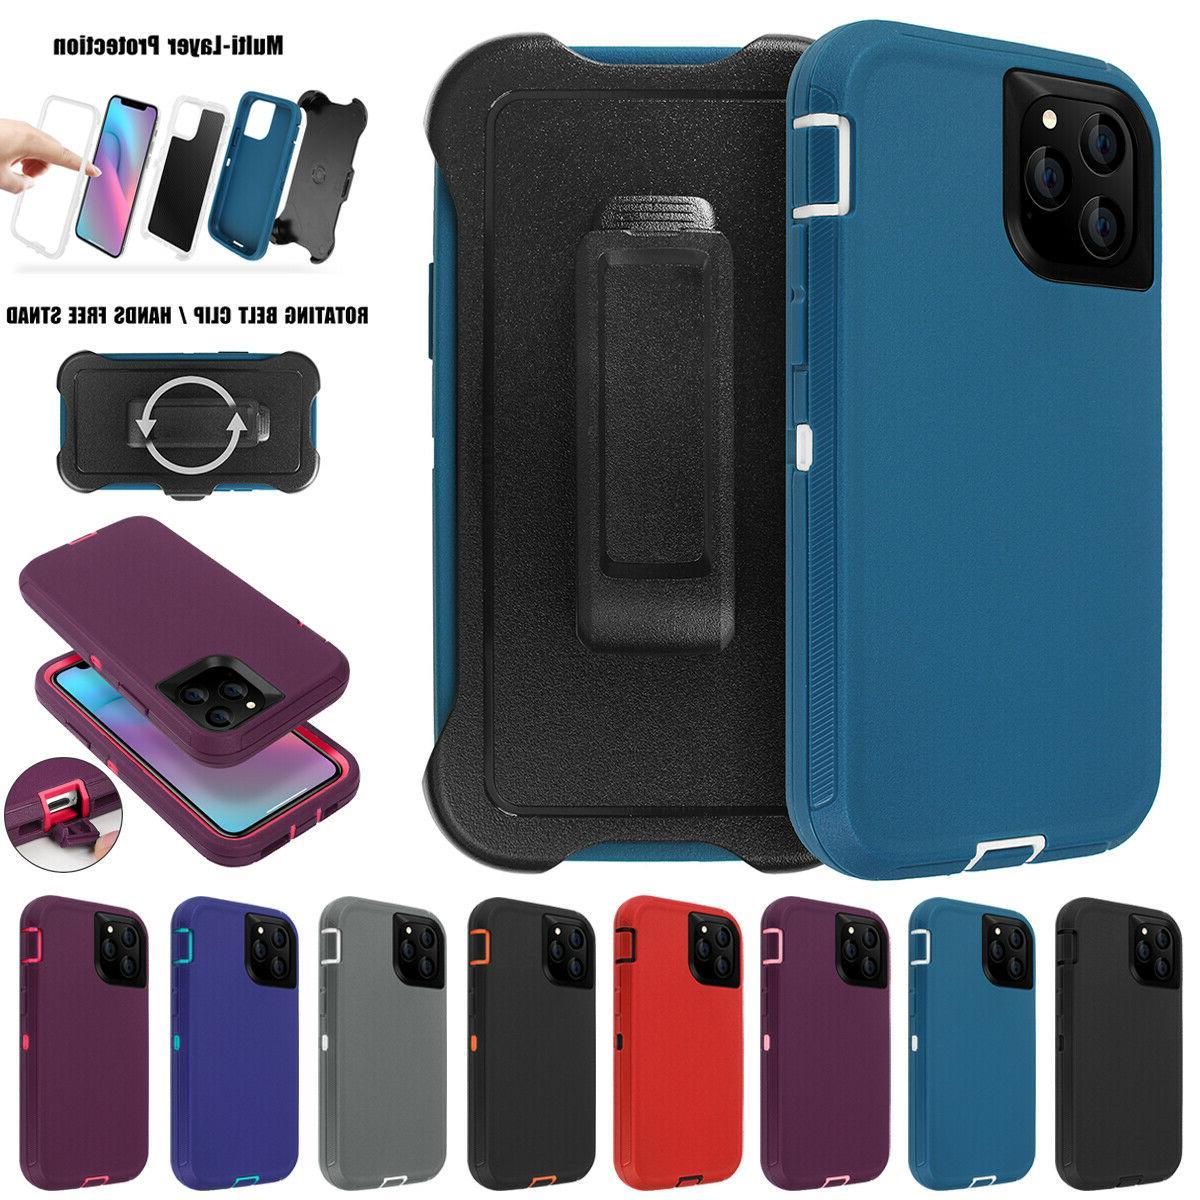 iphone 11 pro max shockproof hybrid